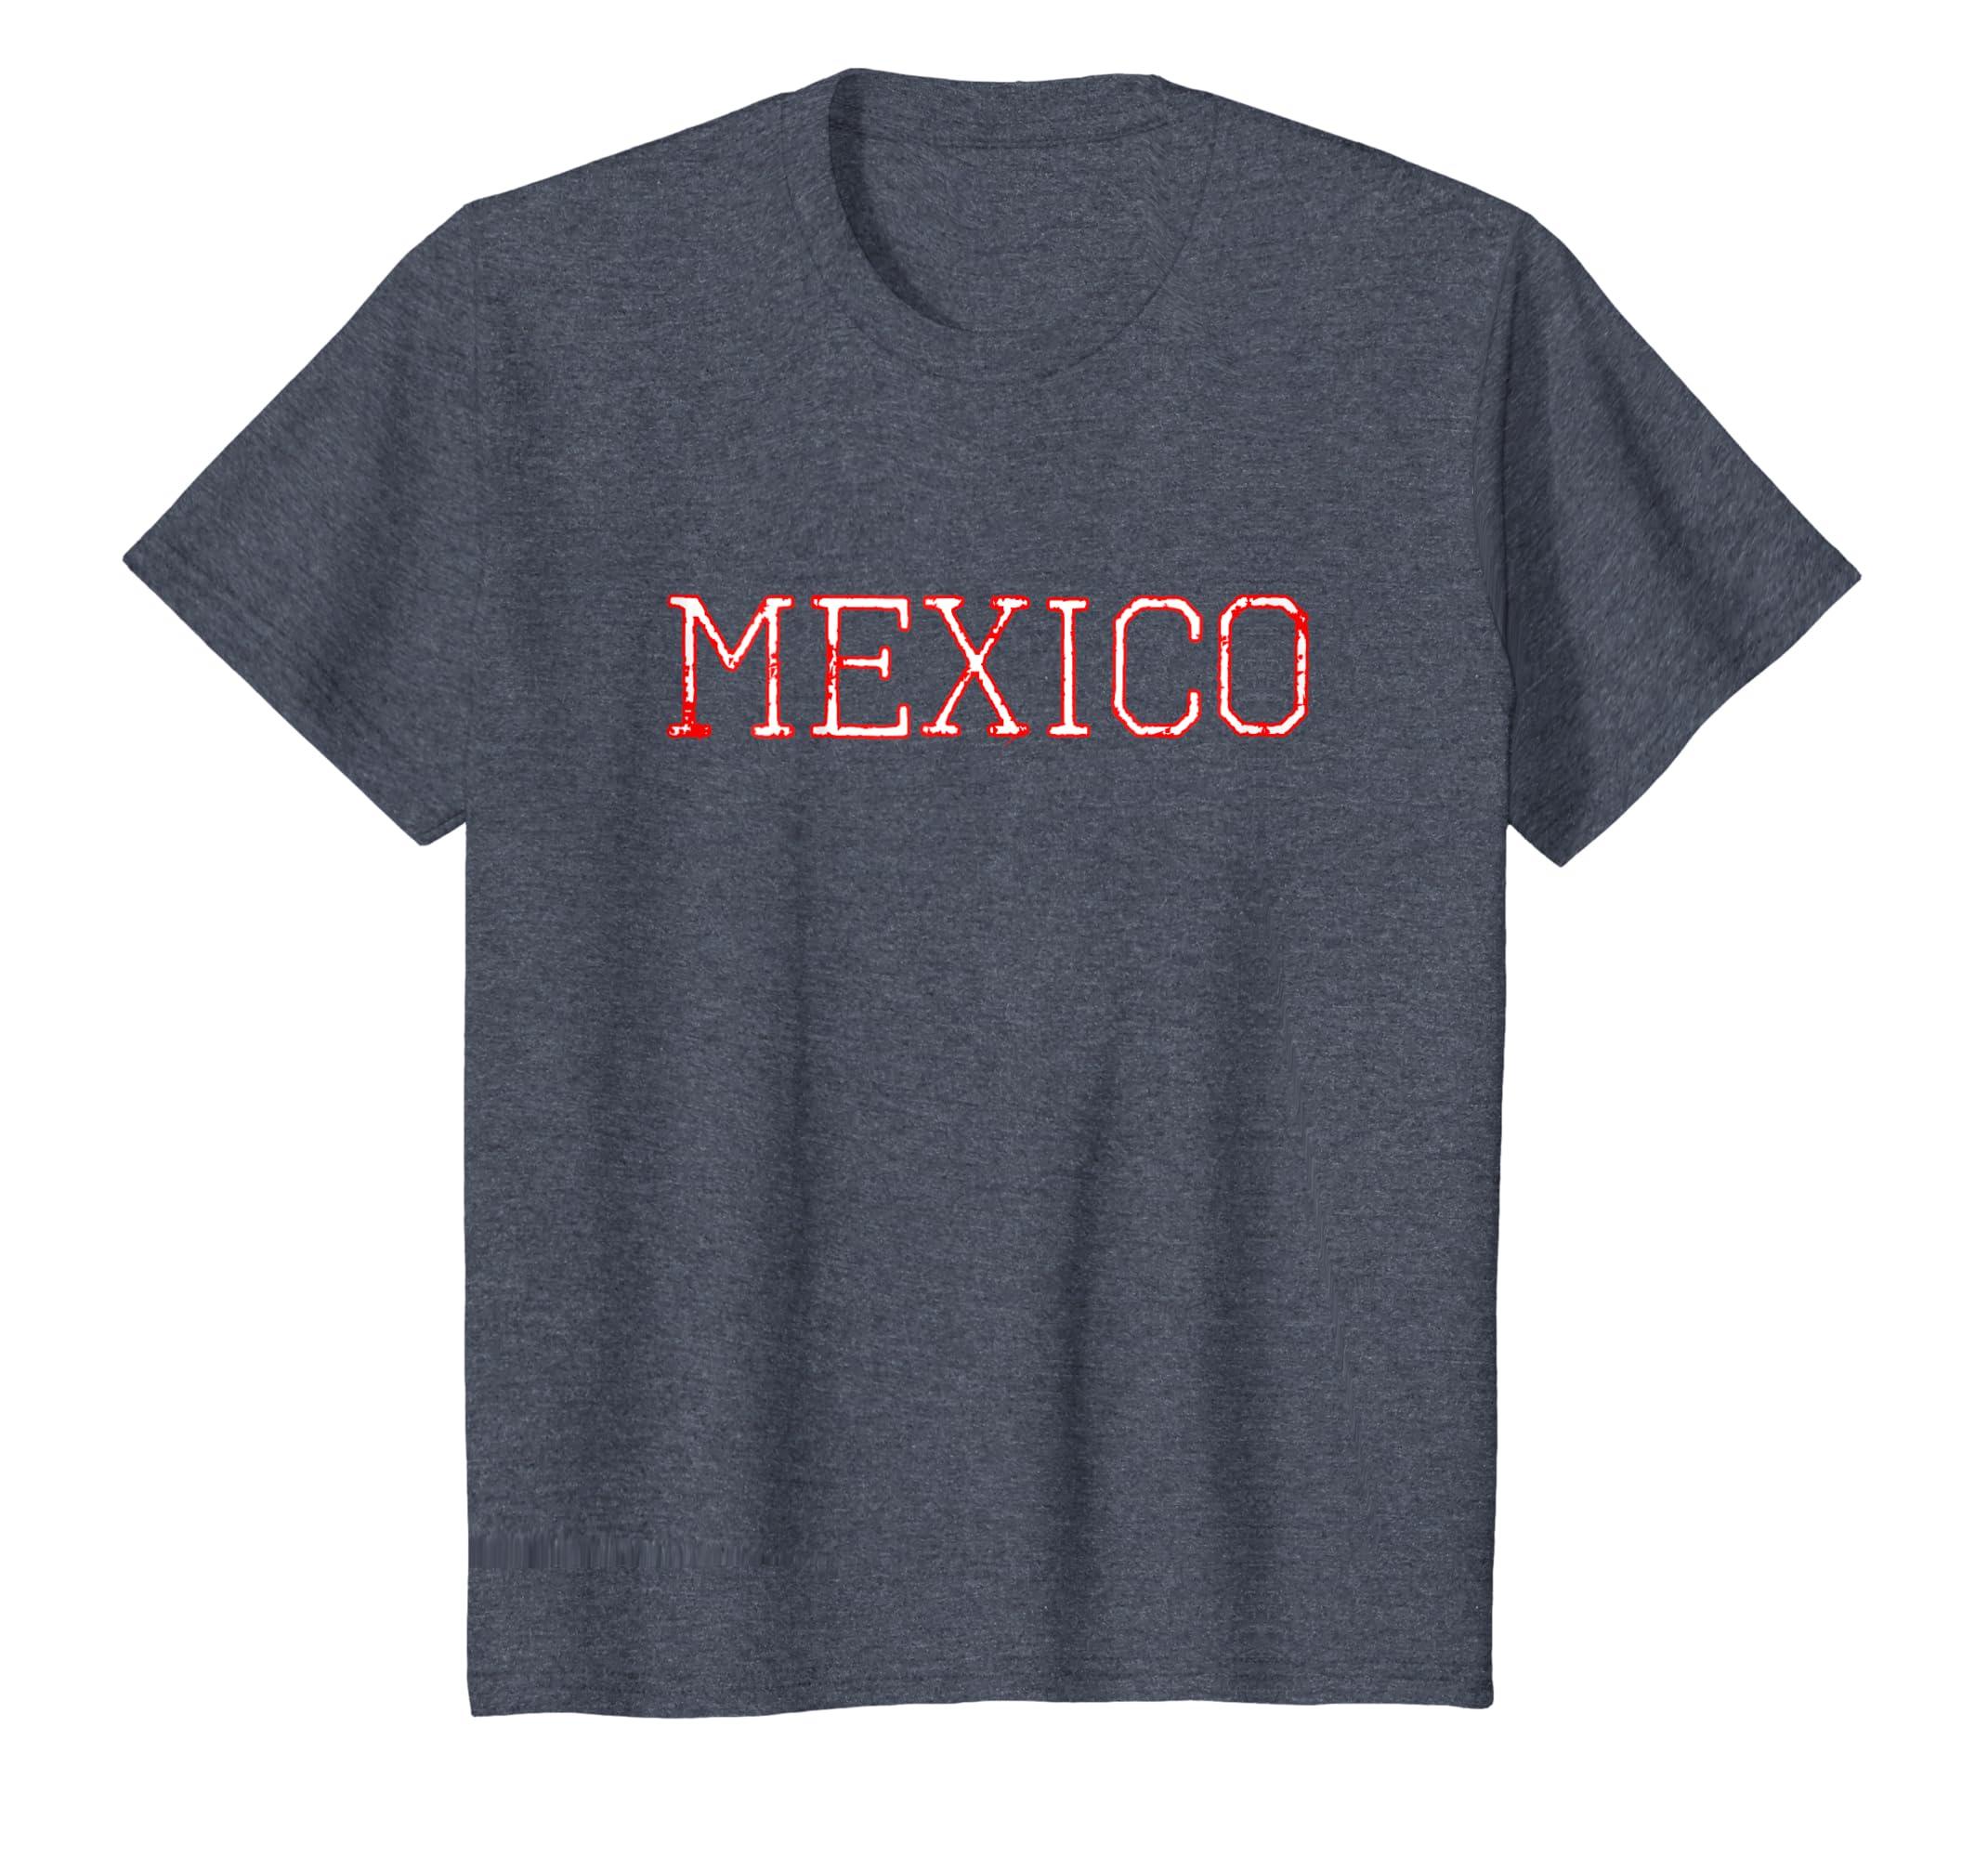 Amazon.com  Vintage Retro Mexican Football Jersey for Tri Fans  Clothing 225a1abb8e299